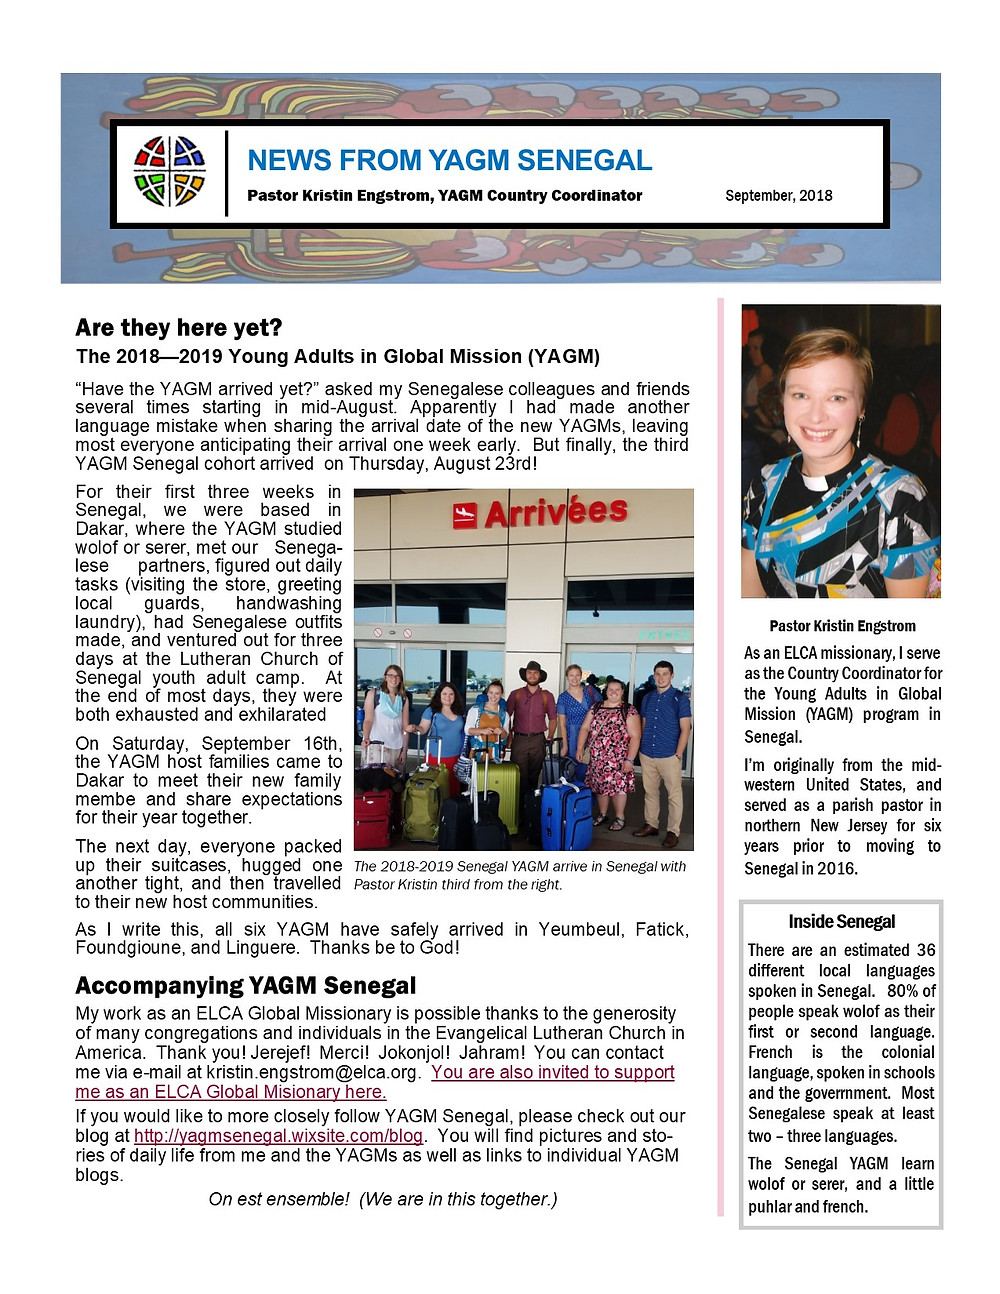 September Newsletter, page 1